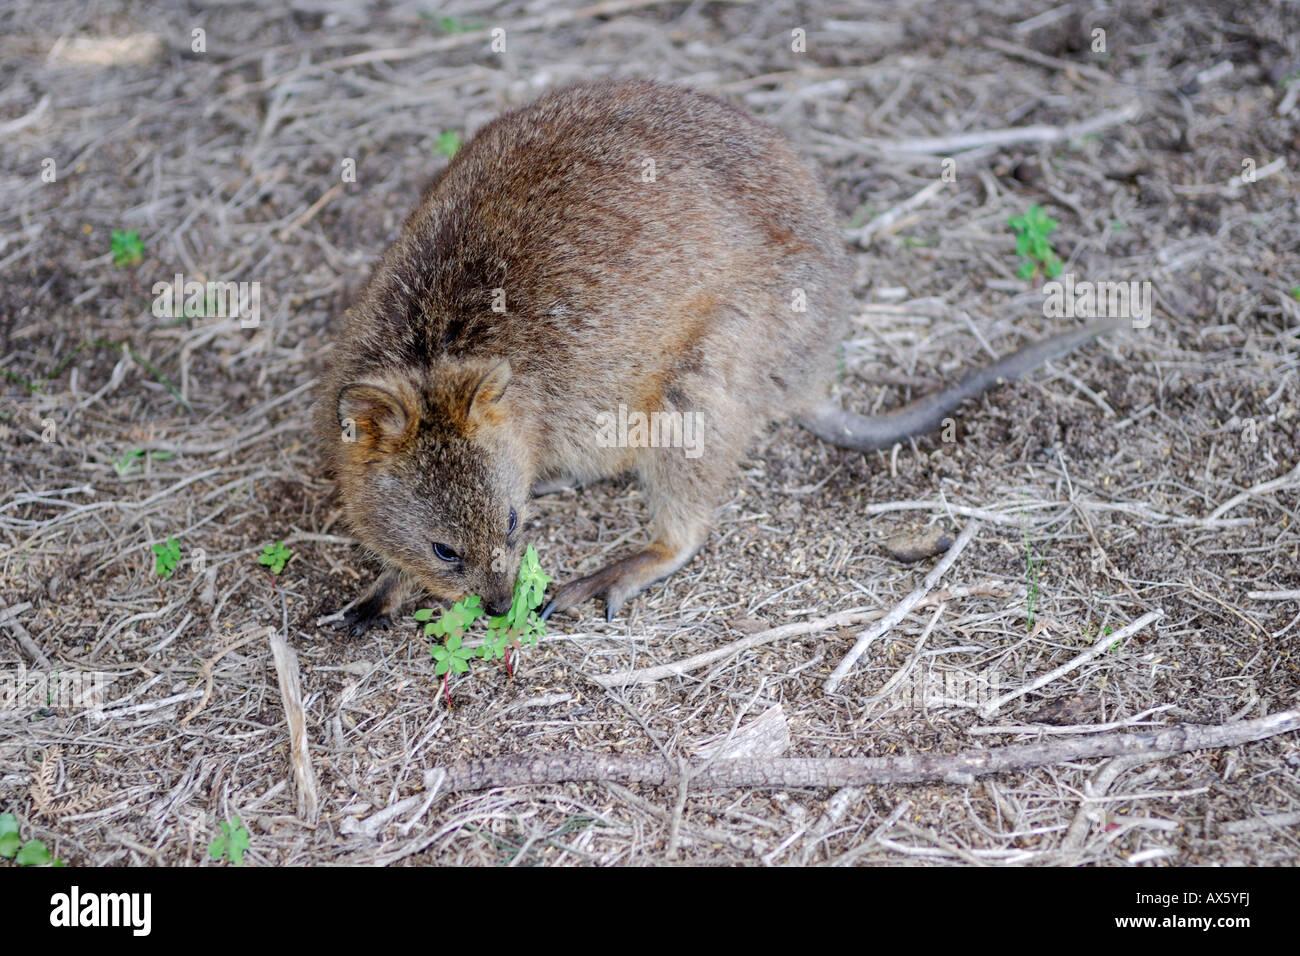 Quokka (Setonix brachyurus), marsupial species, Rottnest Island near Perth, Western Australia, Australia - Stock Image